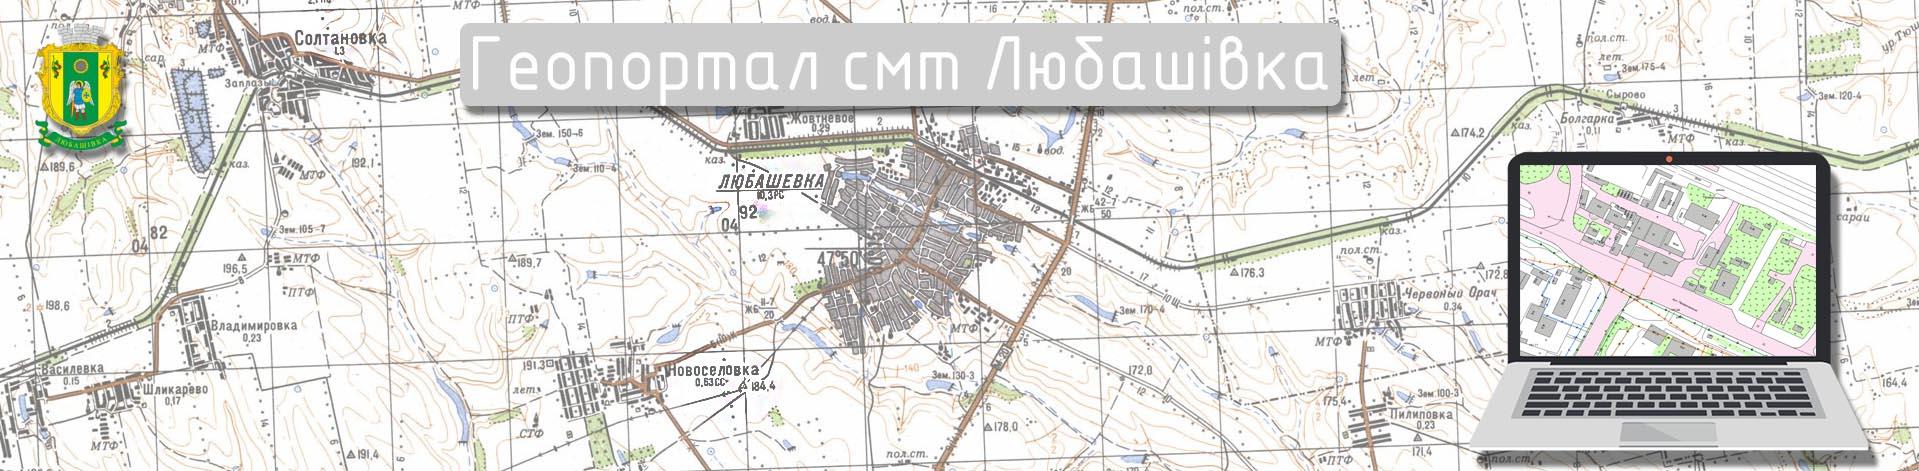 Геопортал смт Любашівка